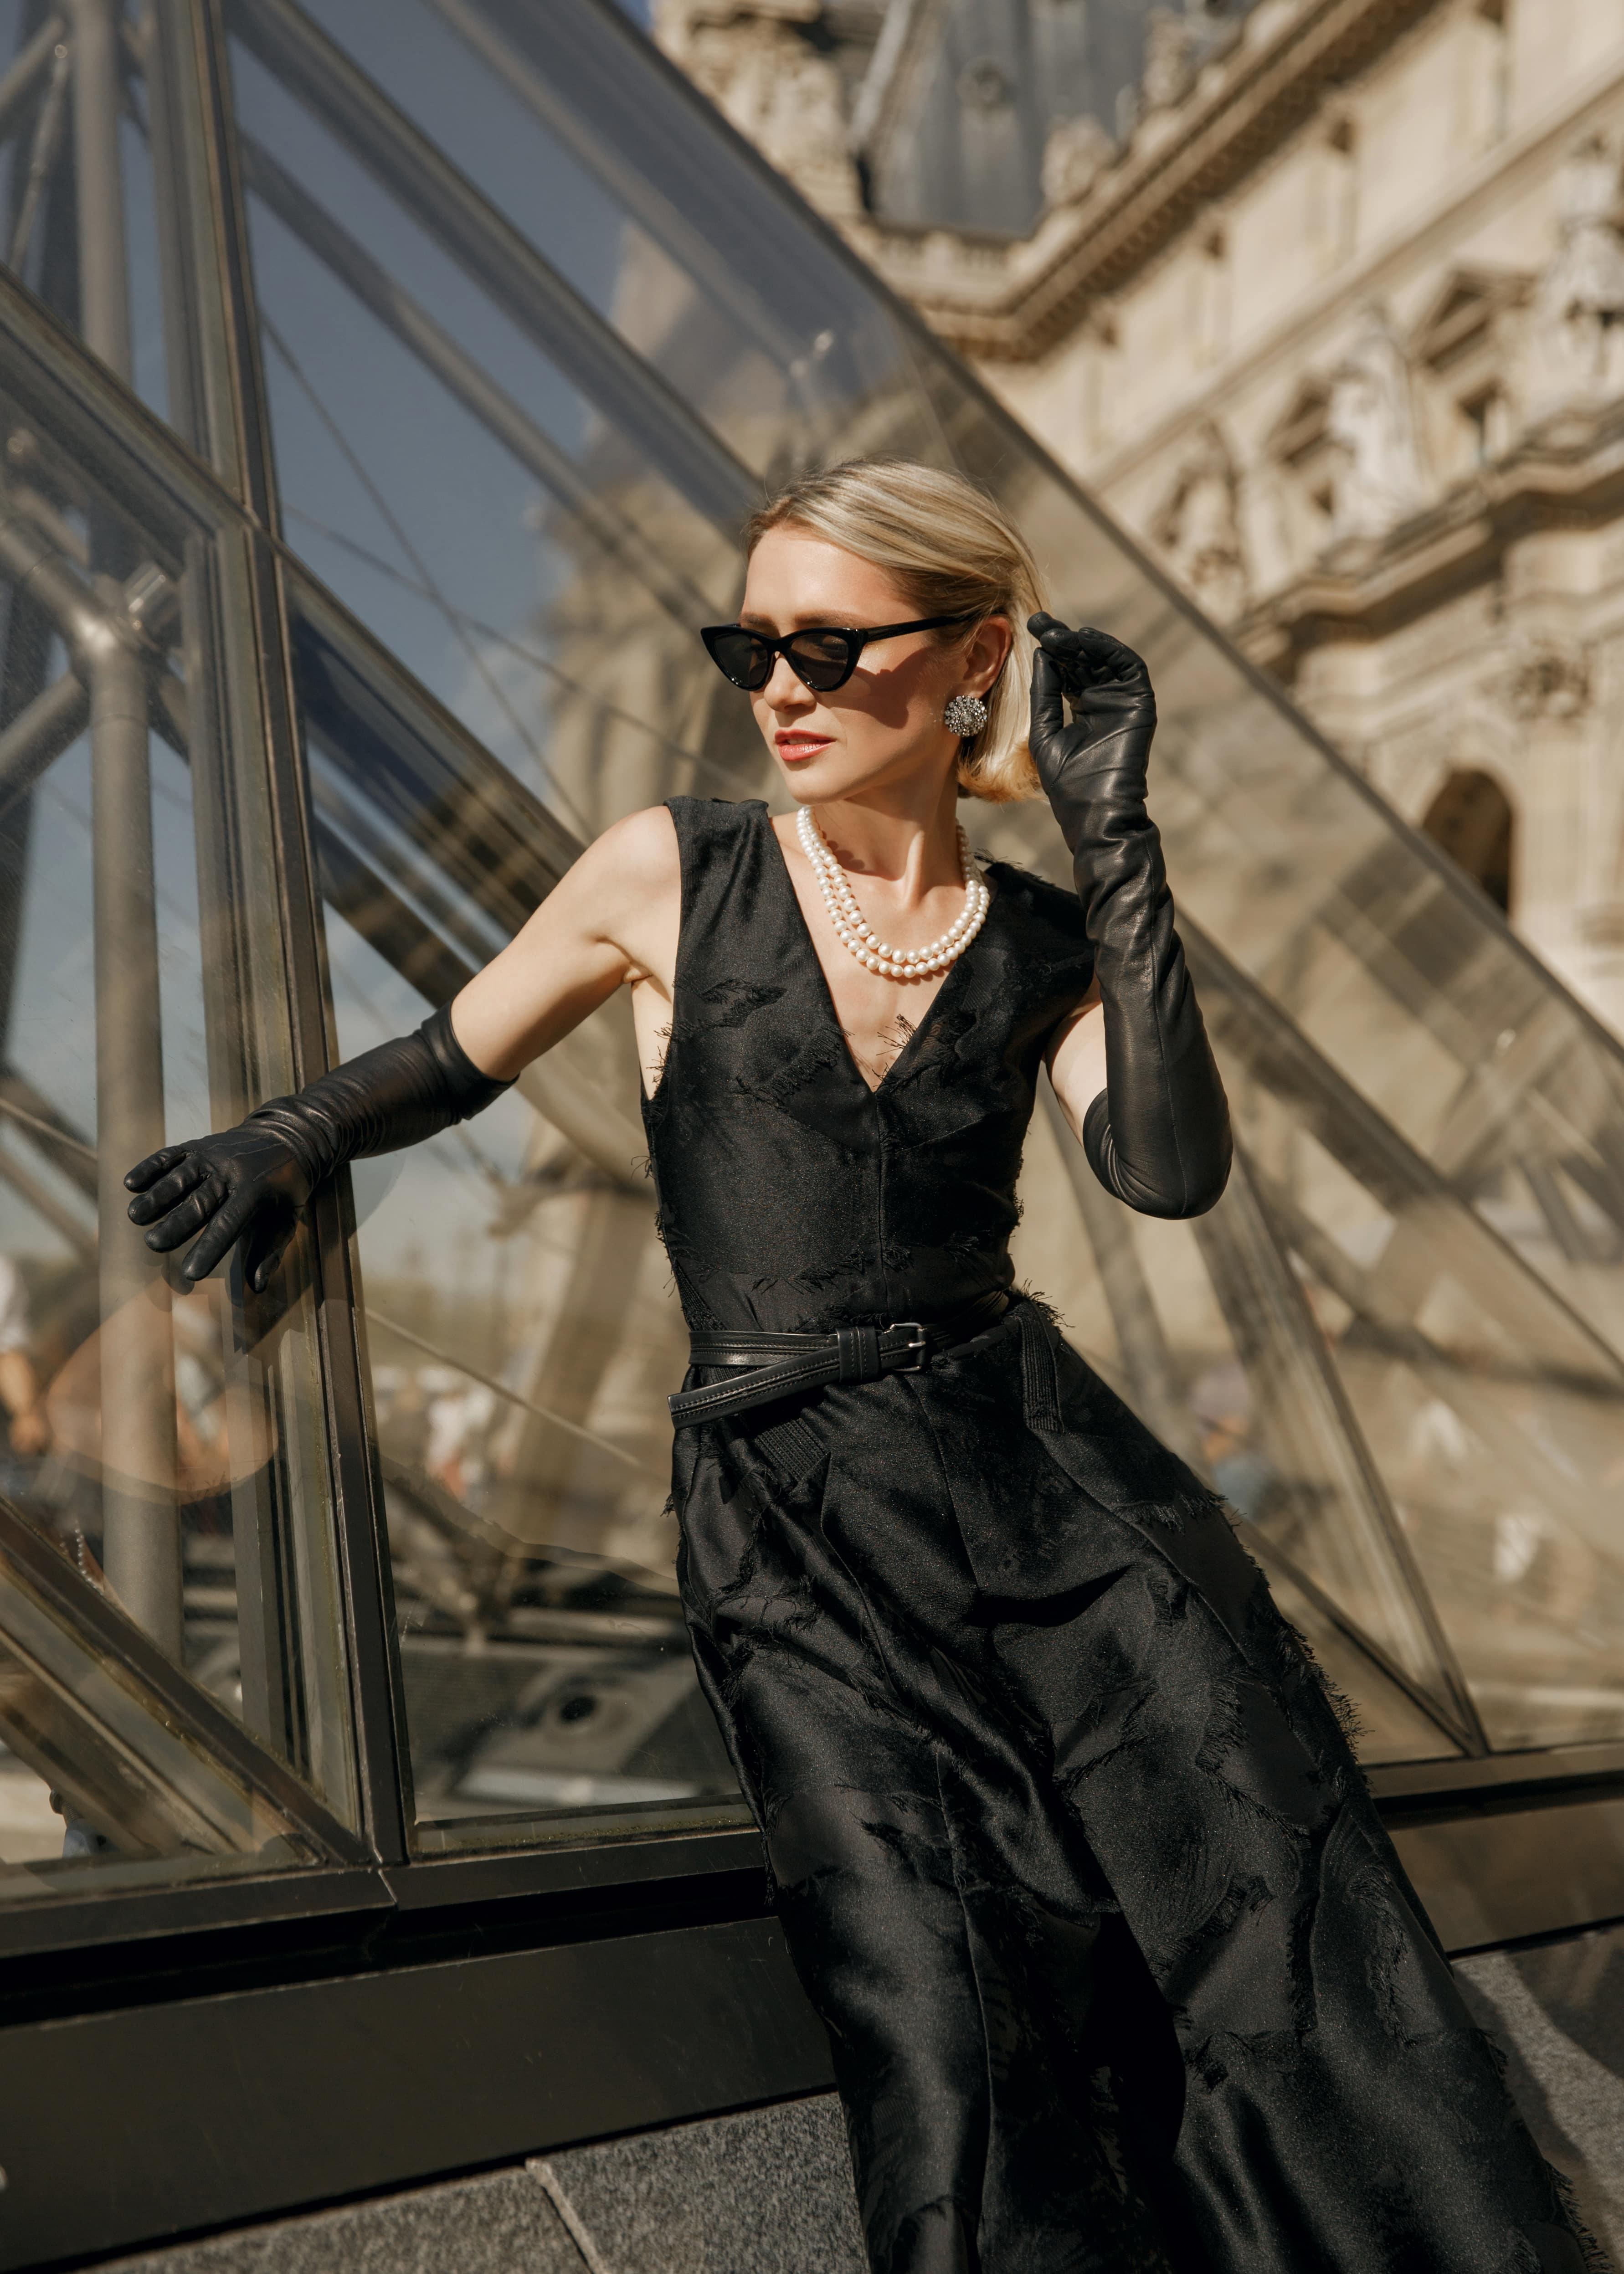 Fashion-беседа с Леной Руна для PrimaVera beauty book